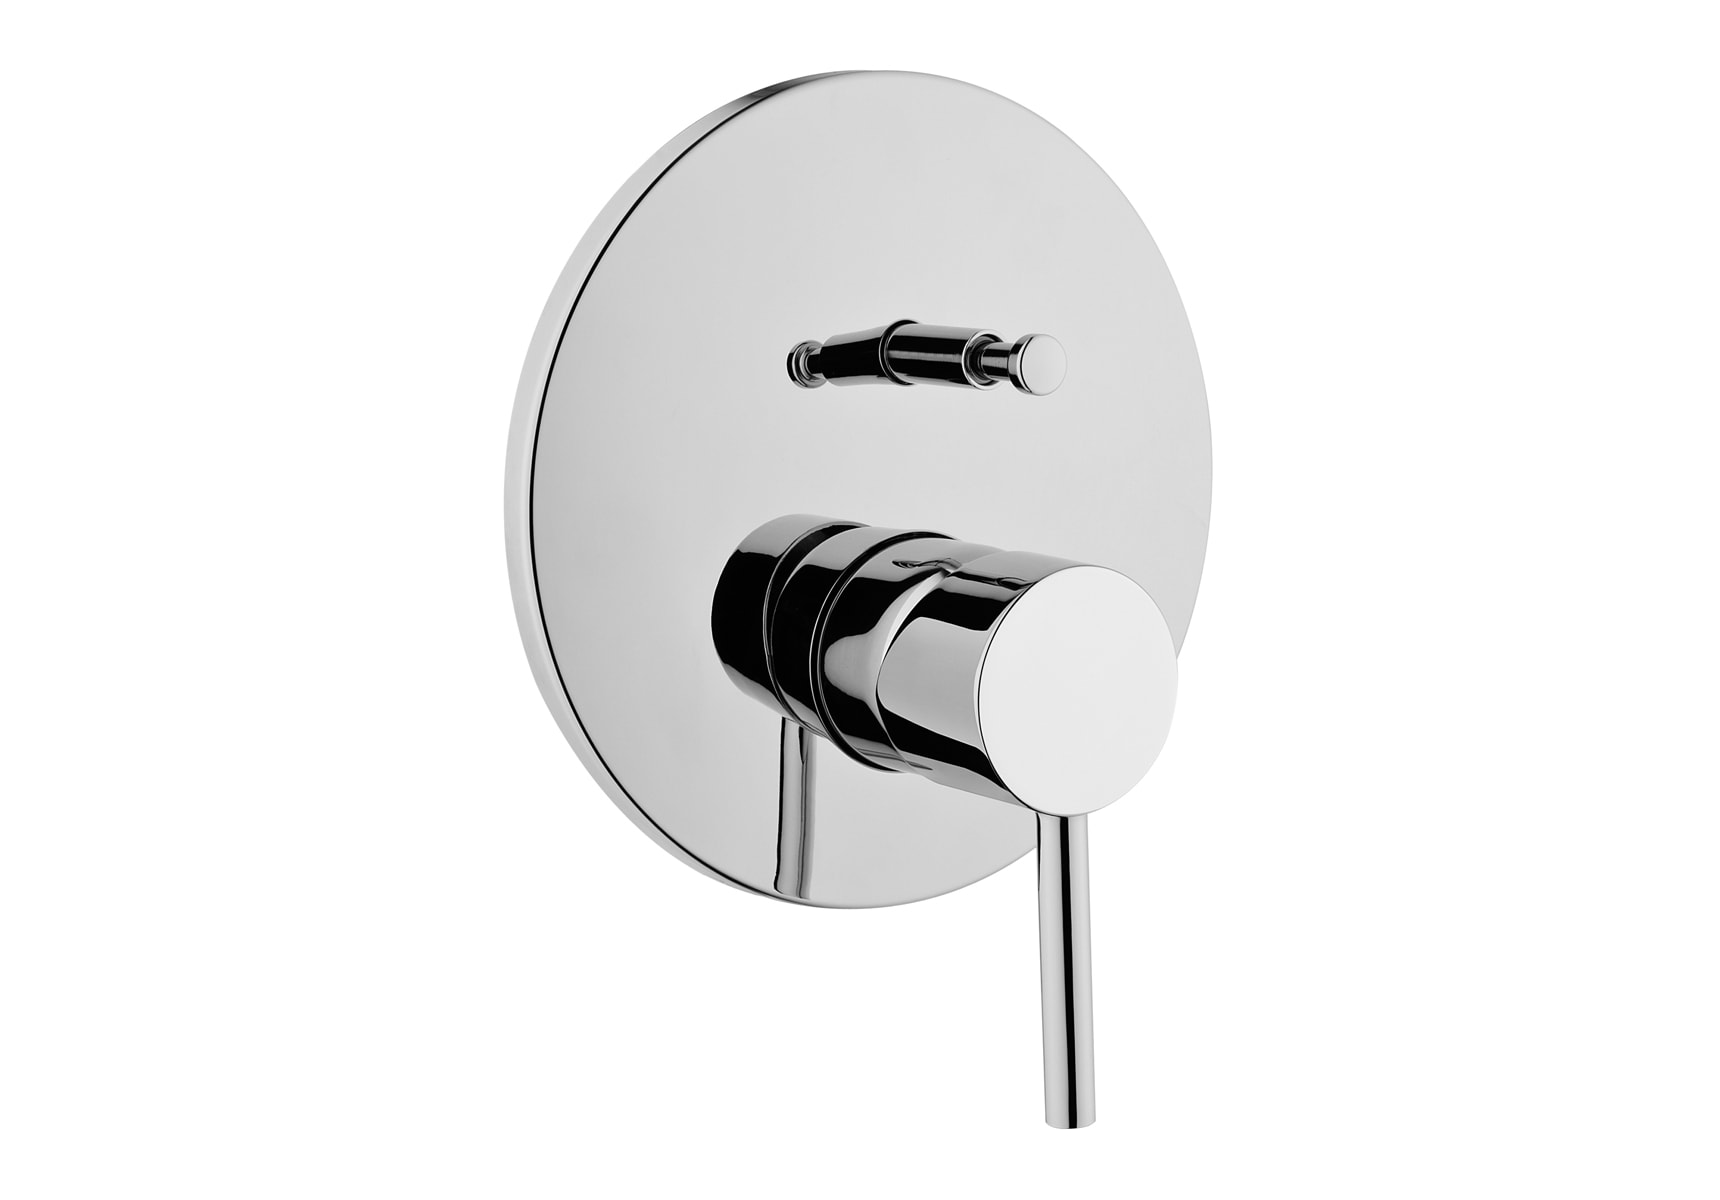 Minimax S Built-in Bath/Shower Mixer (Exposed Part)